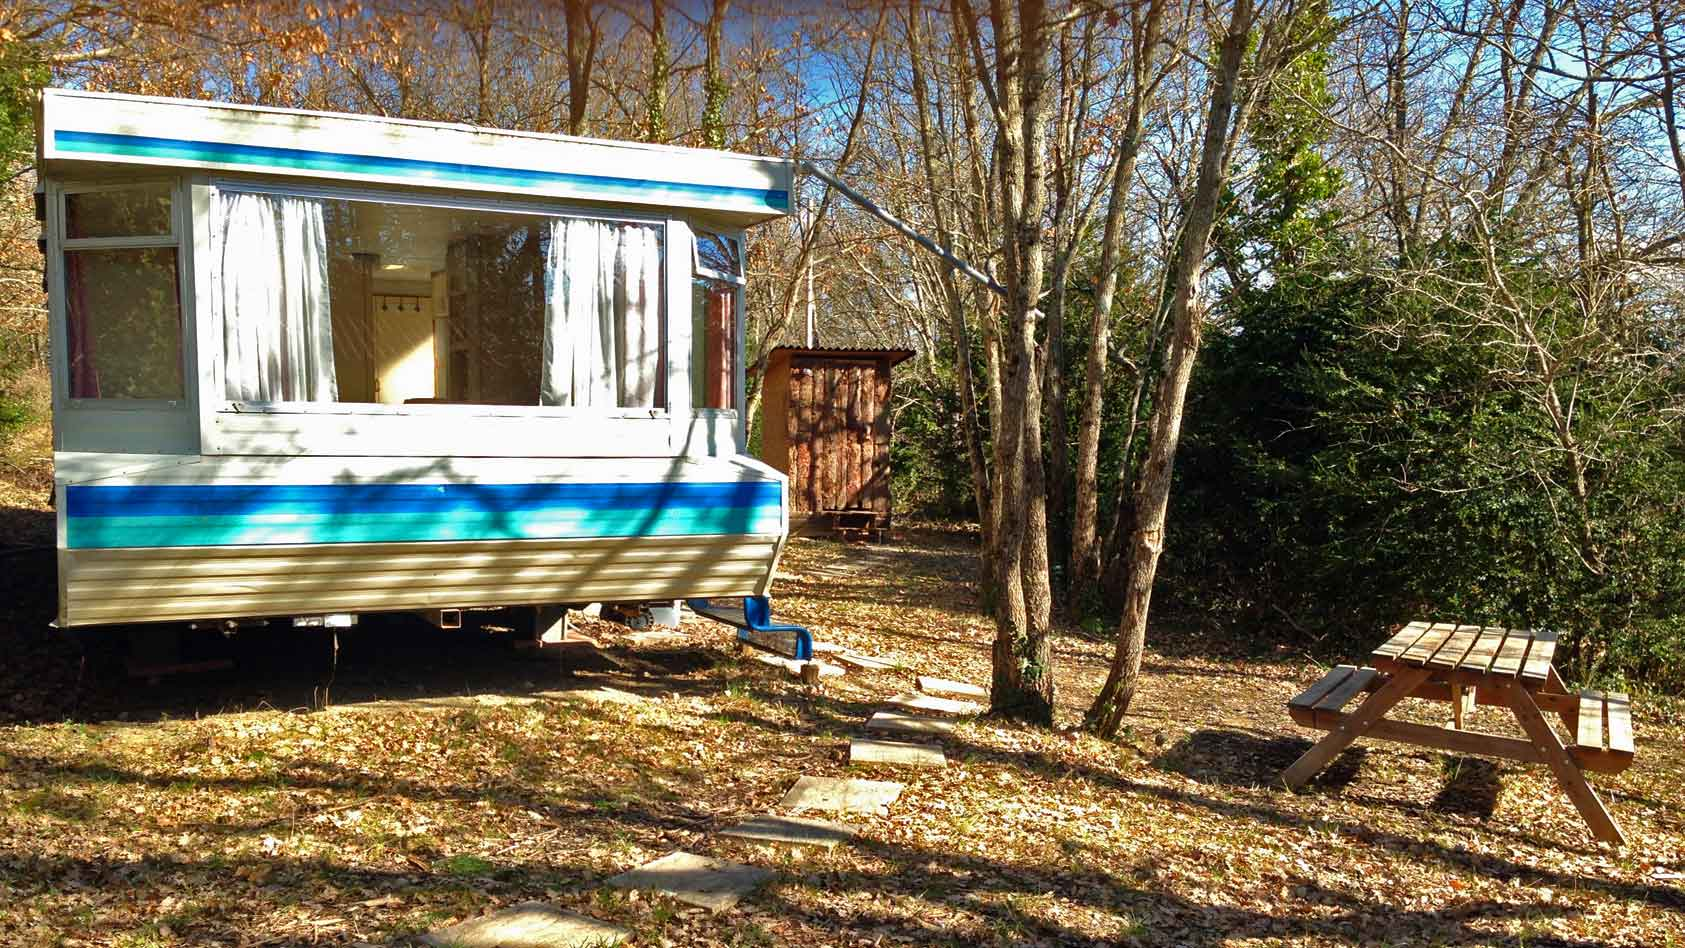 blue-caravan-mobil-home-gardenWEB